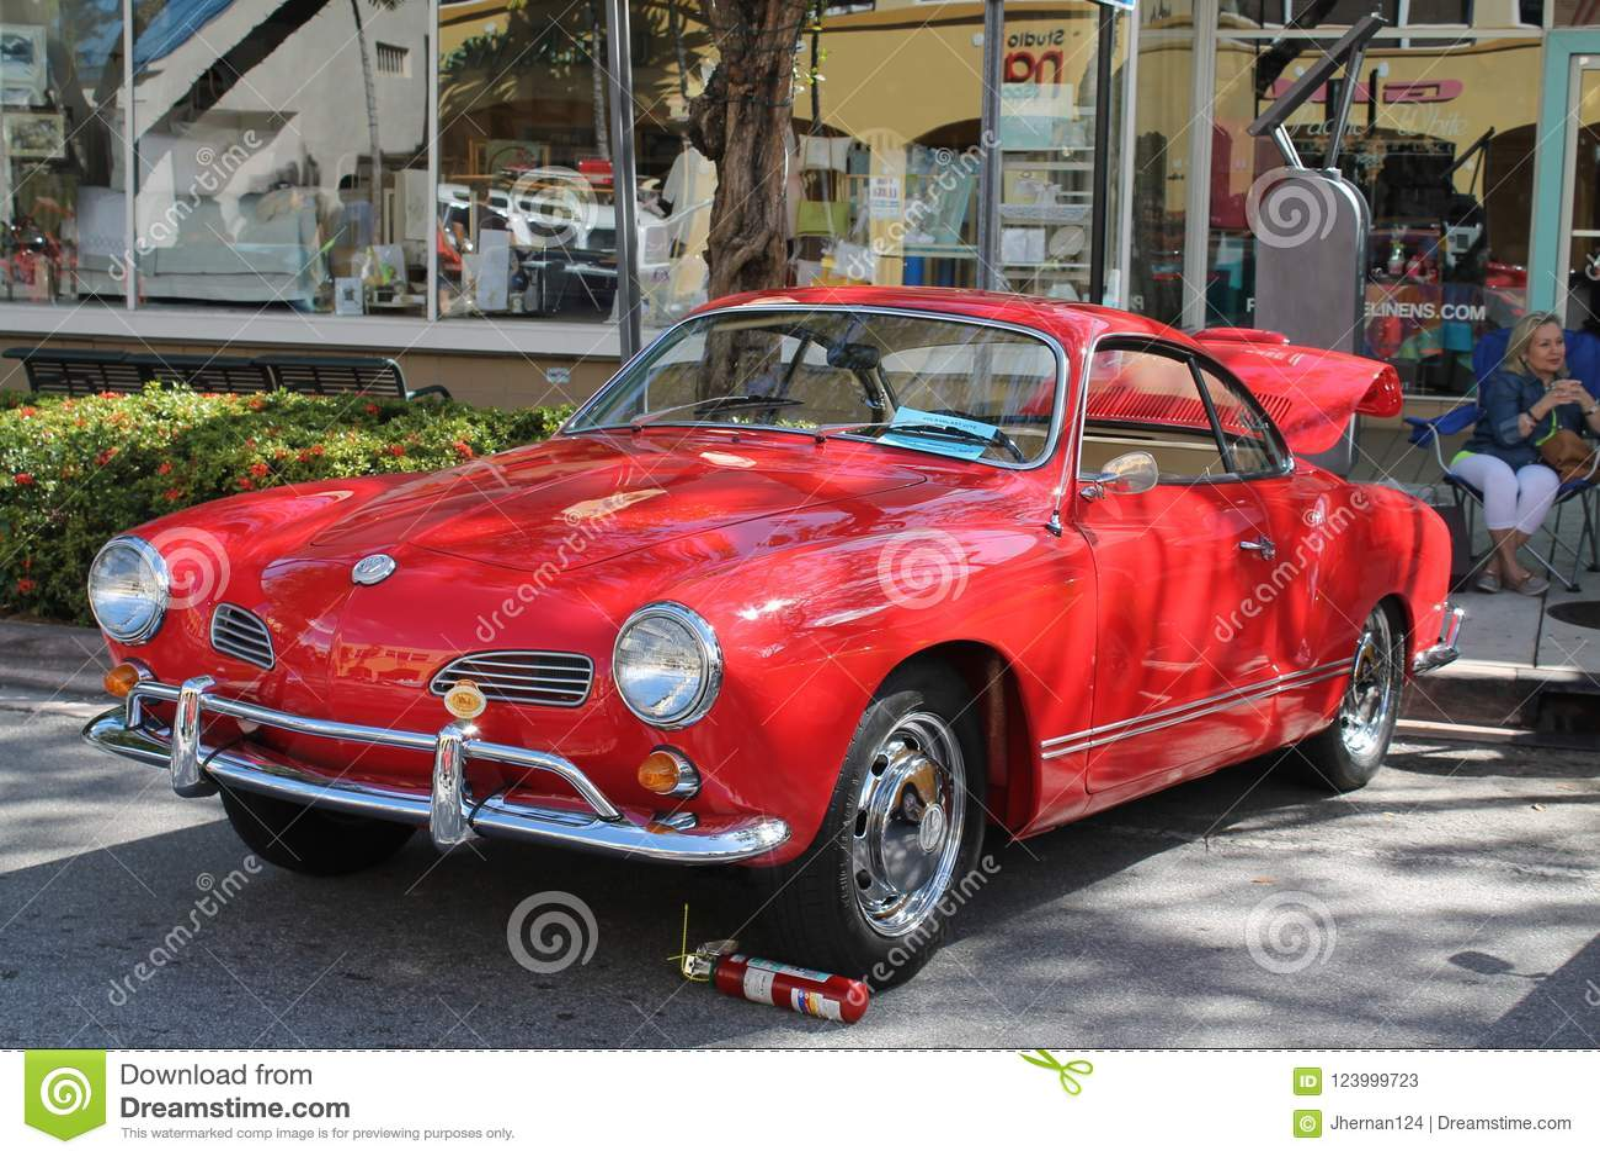 Volkswagen Karmann Ghia clásico